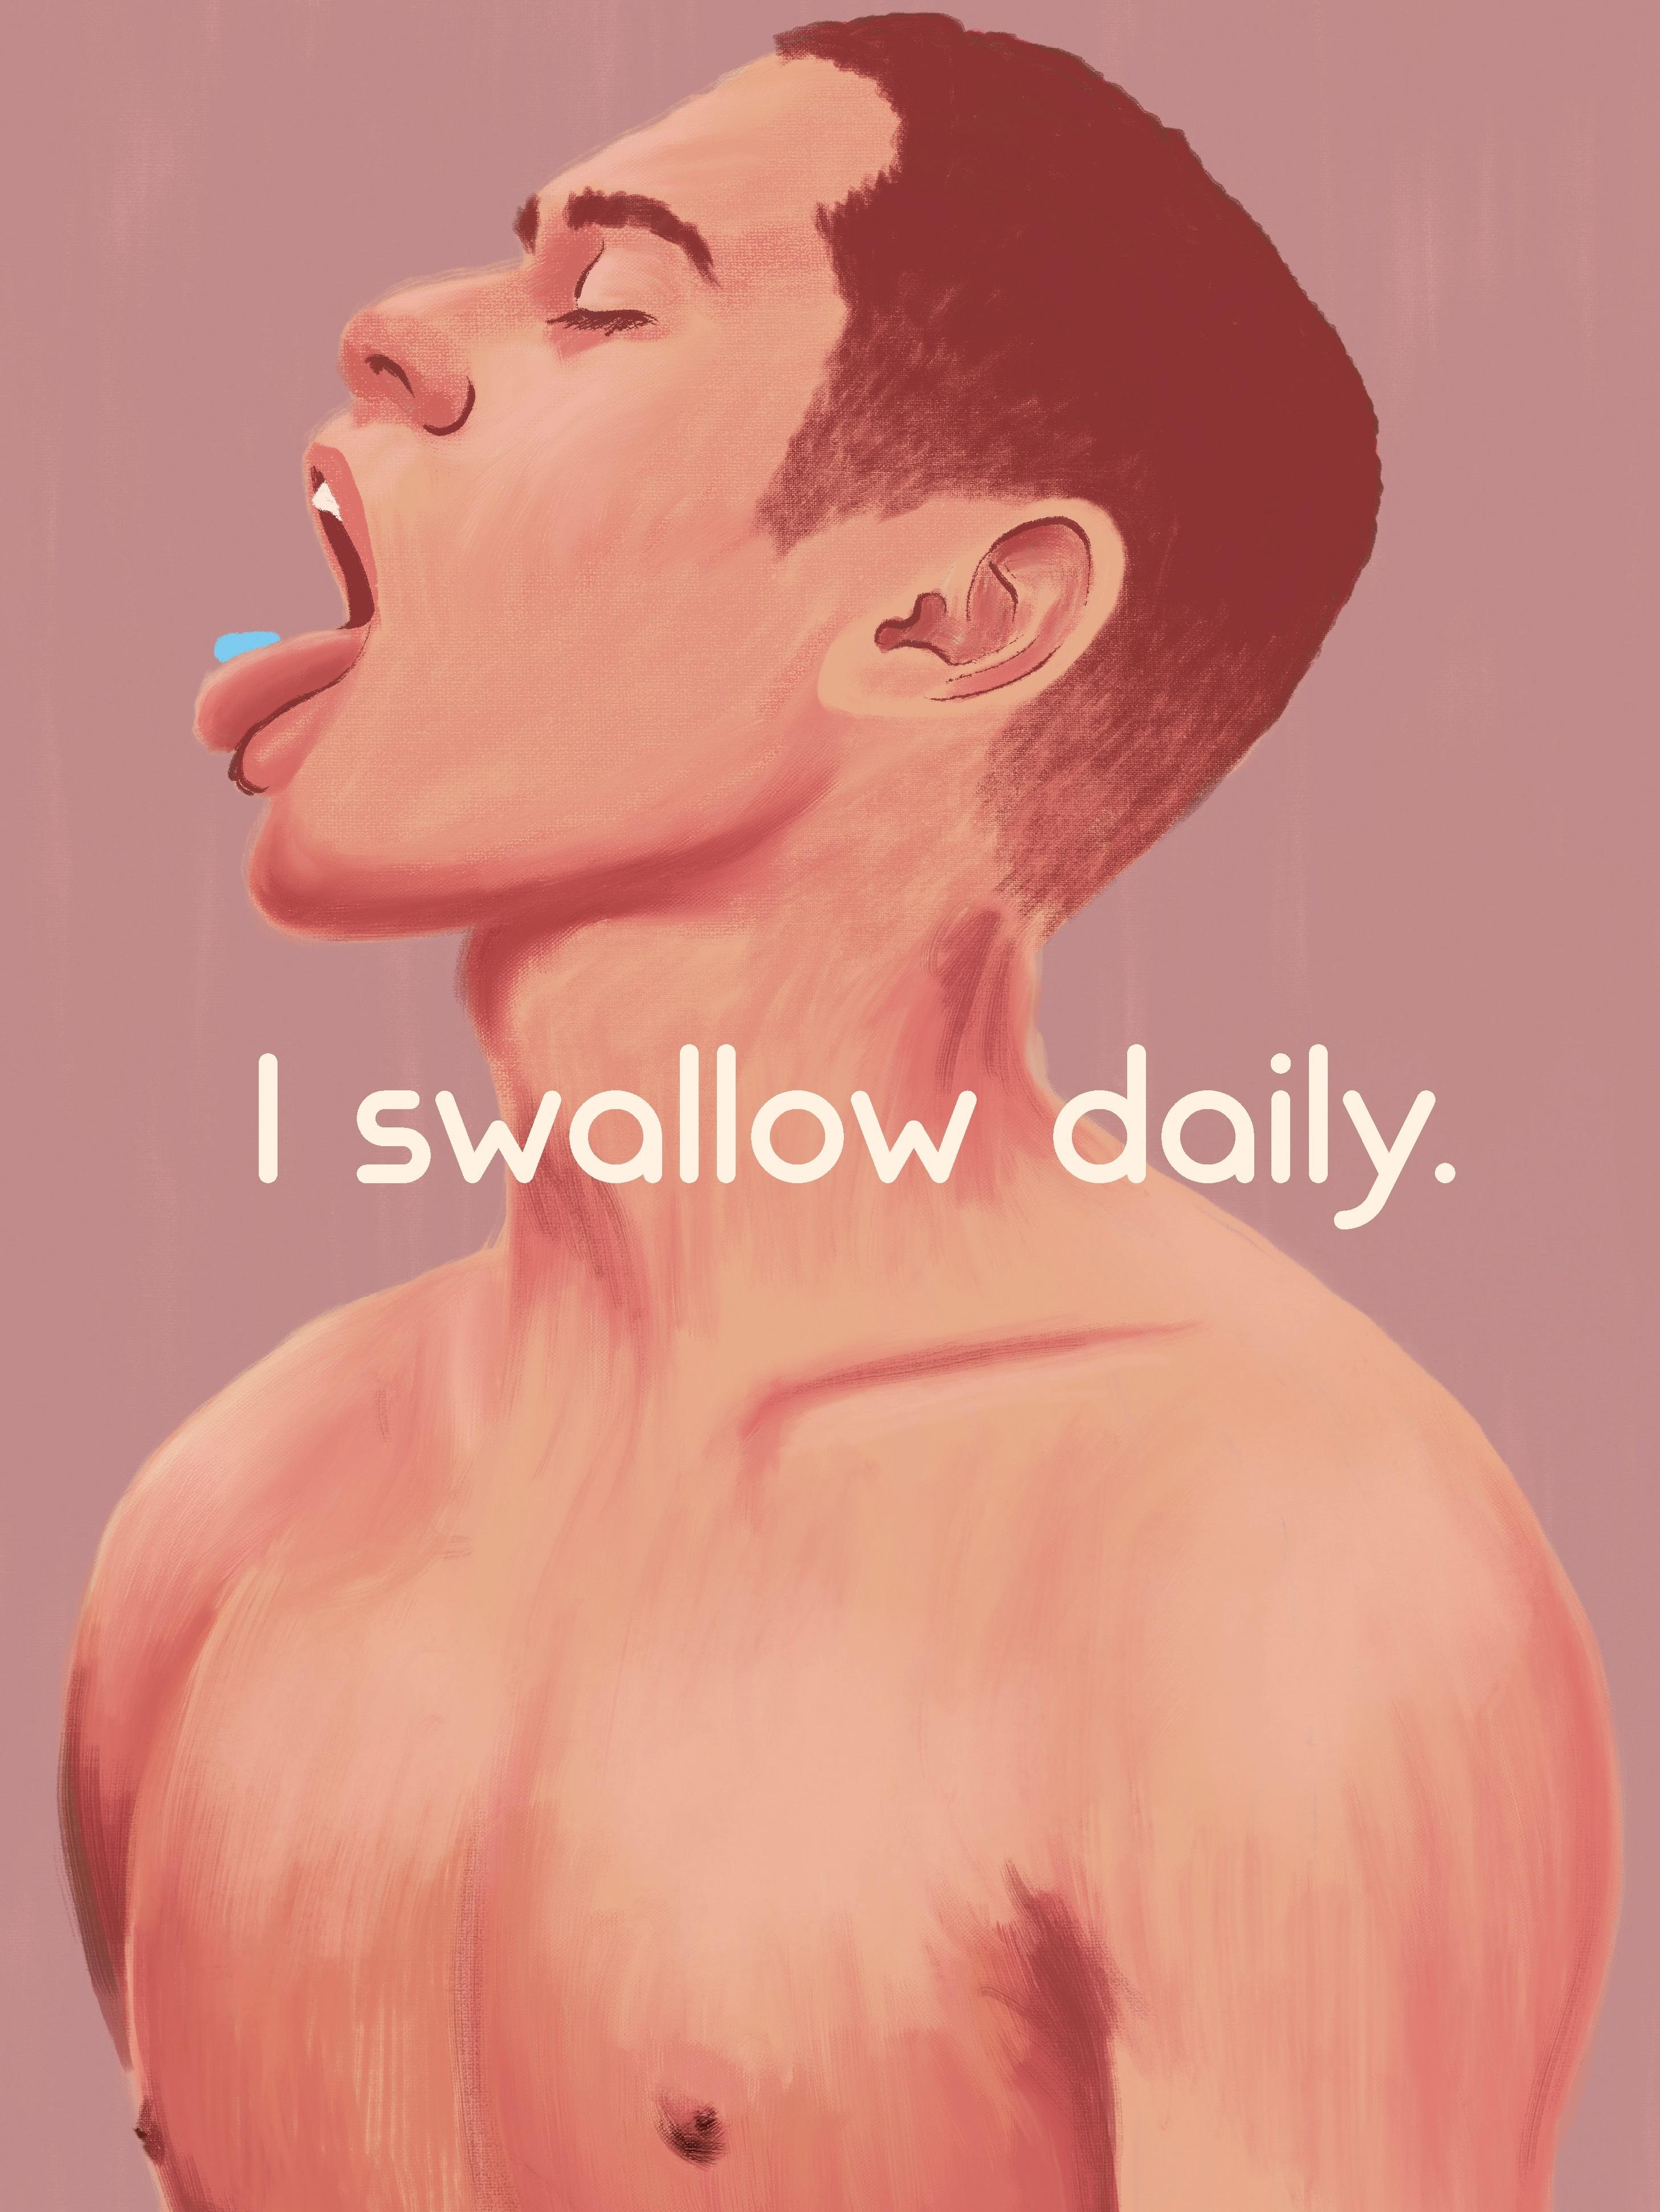 I swallow daily